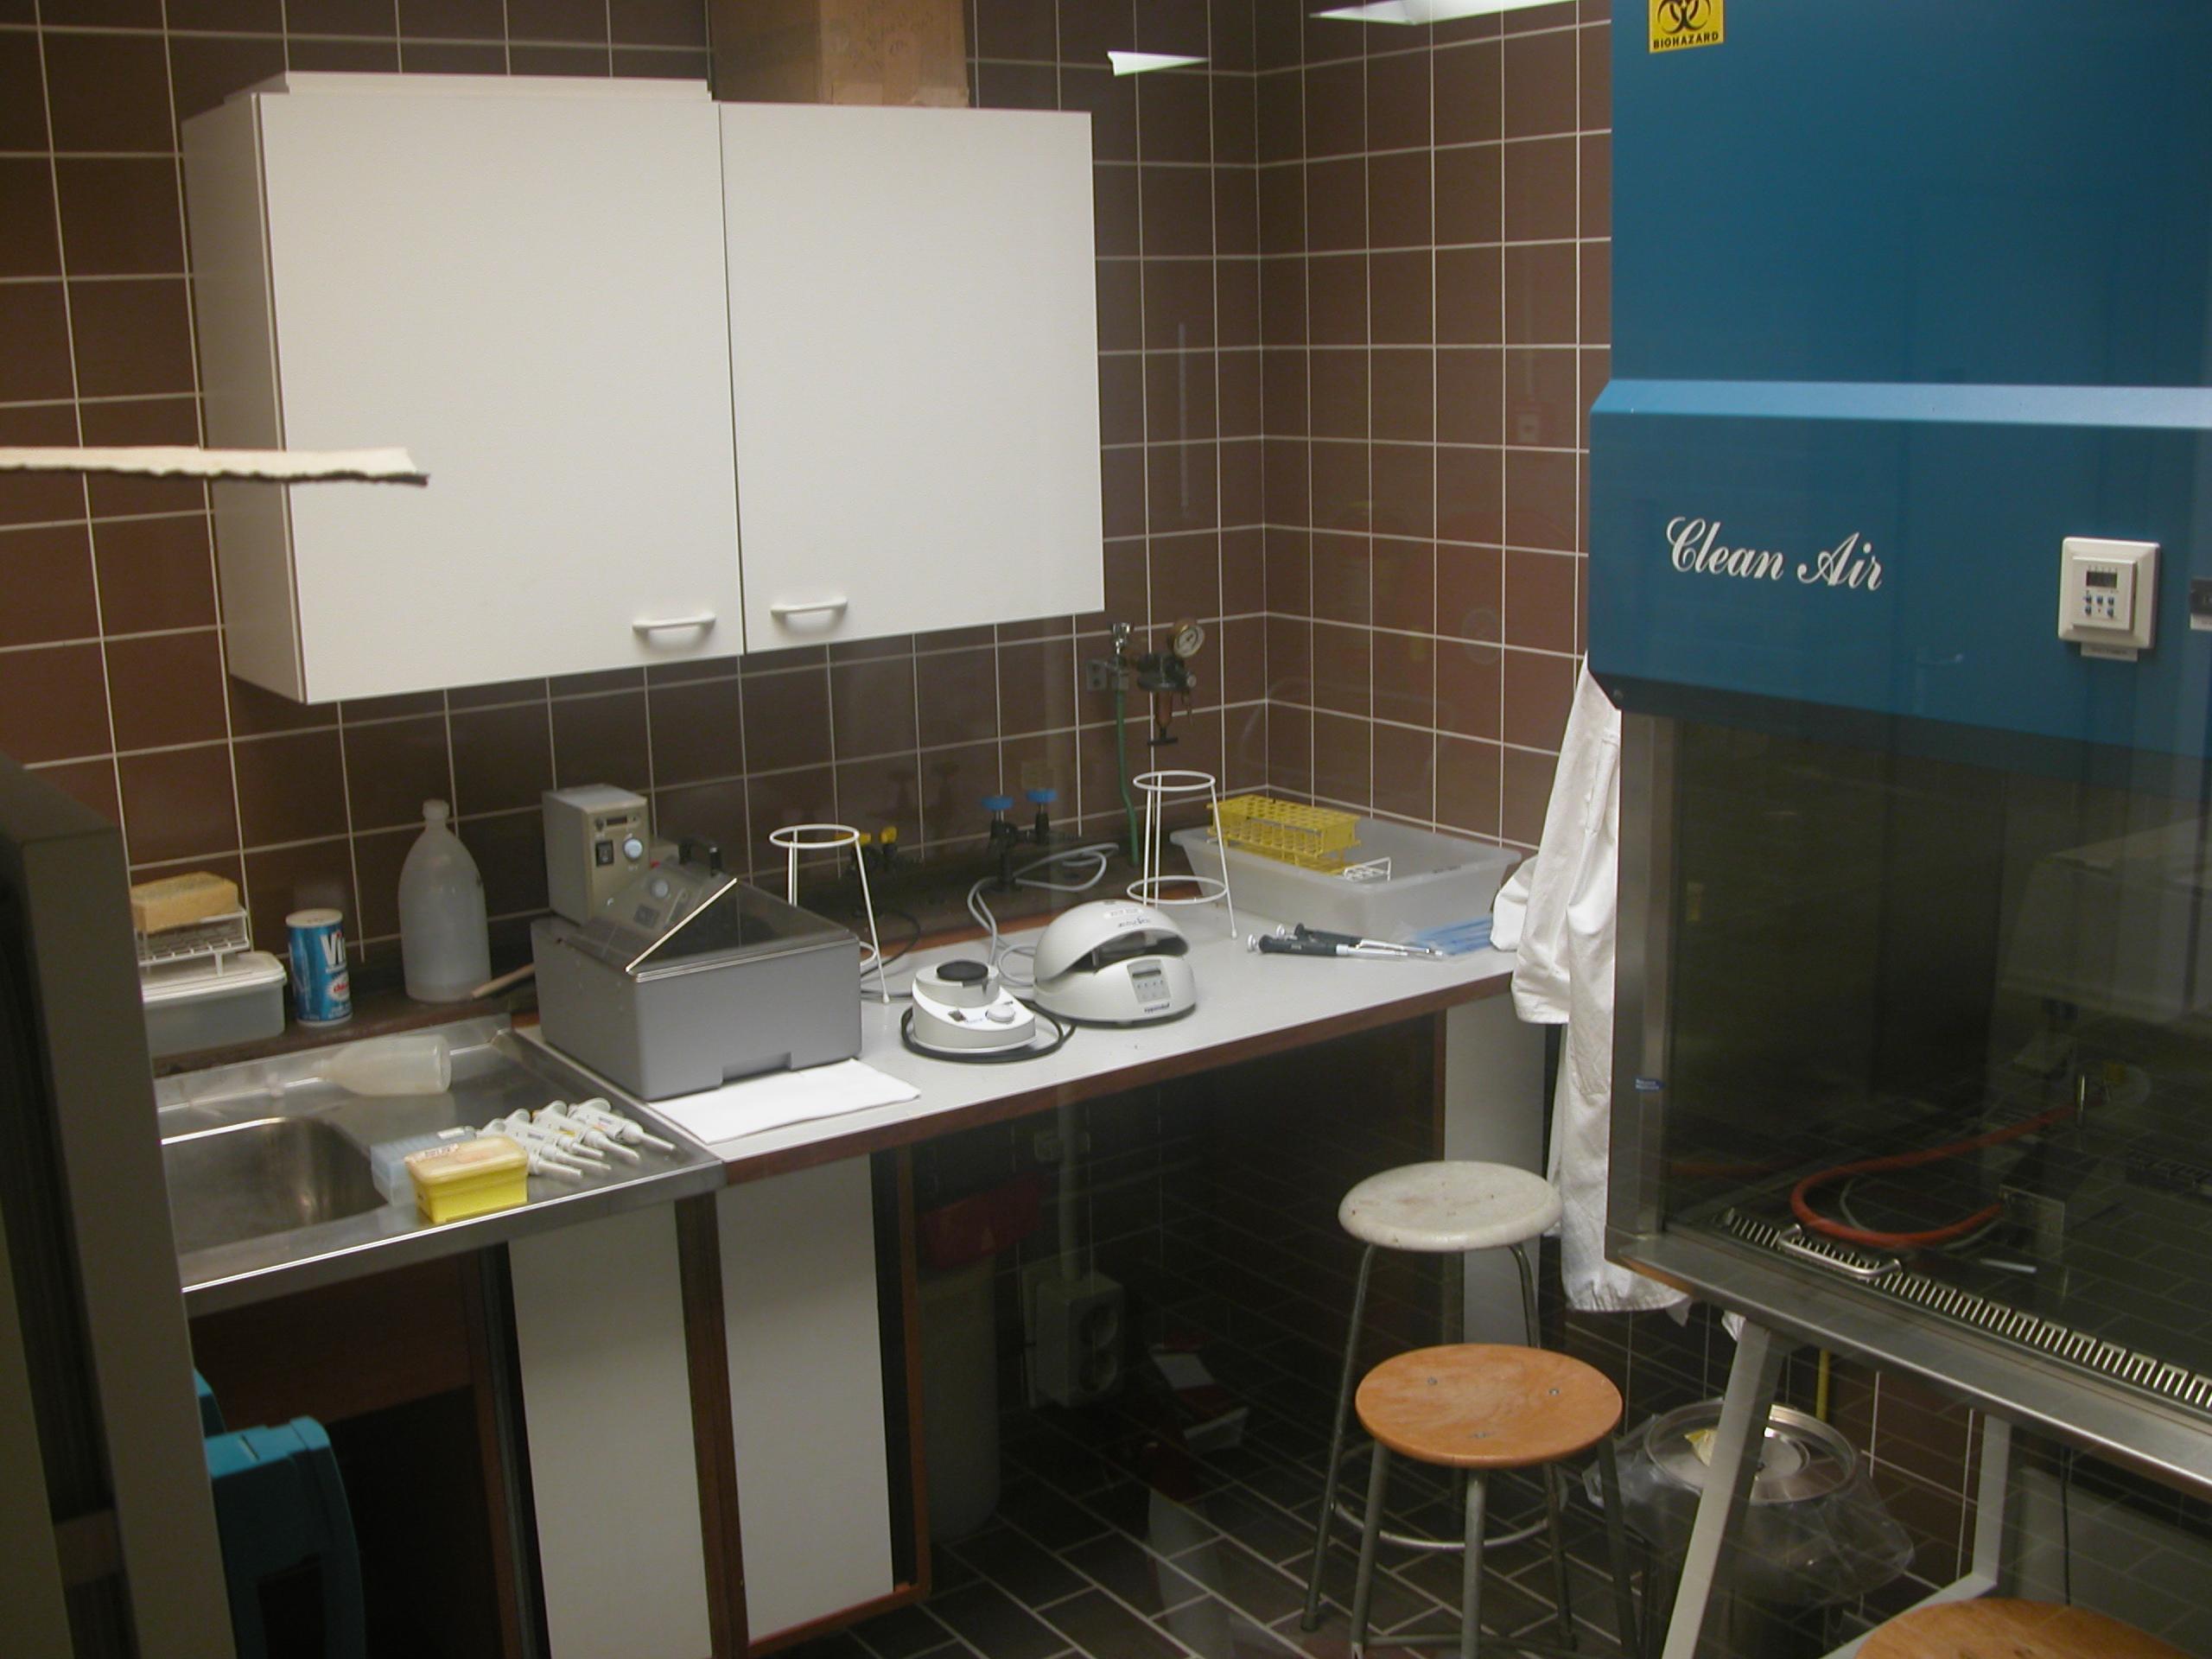 doctor kitchen medial equipment syringe